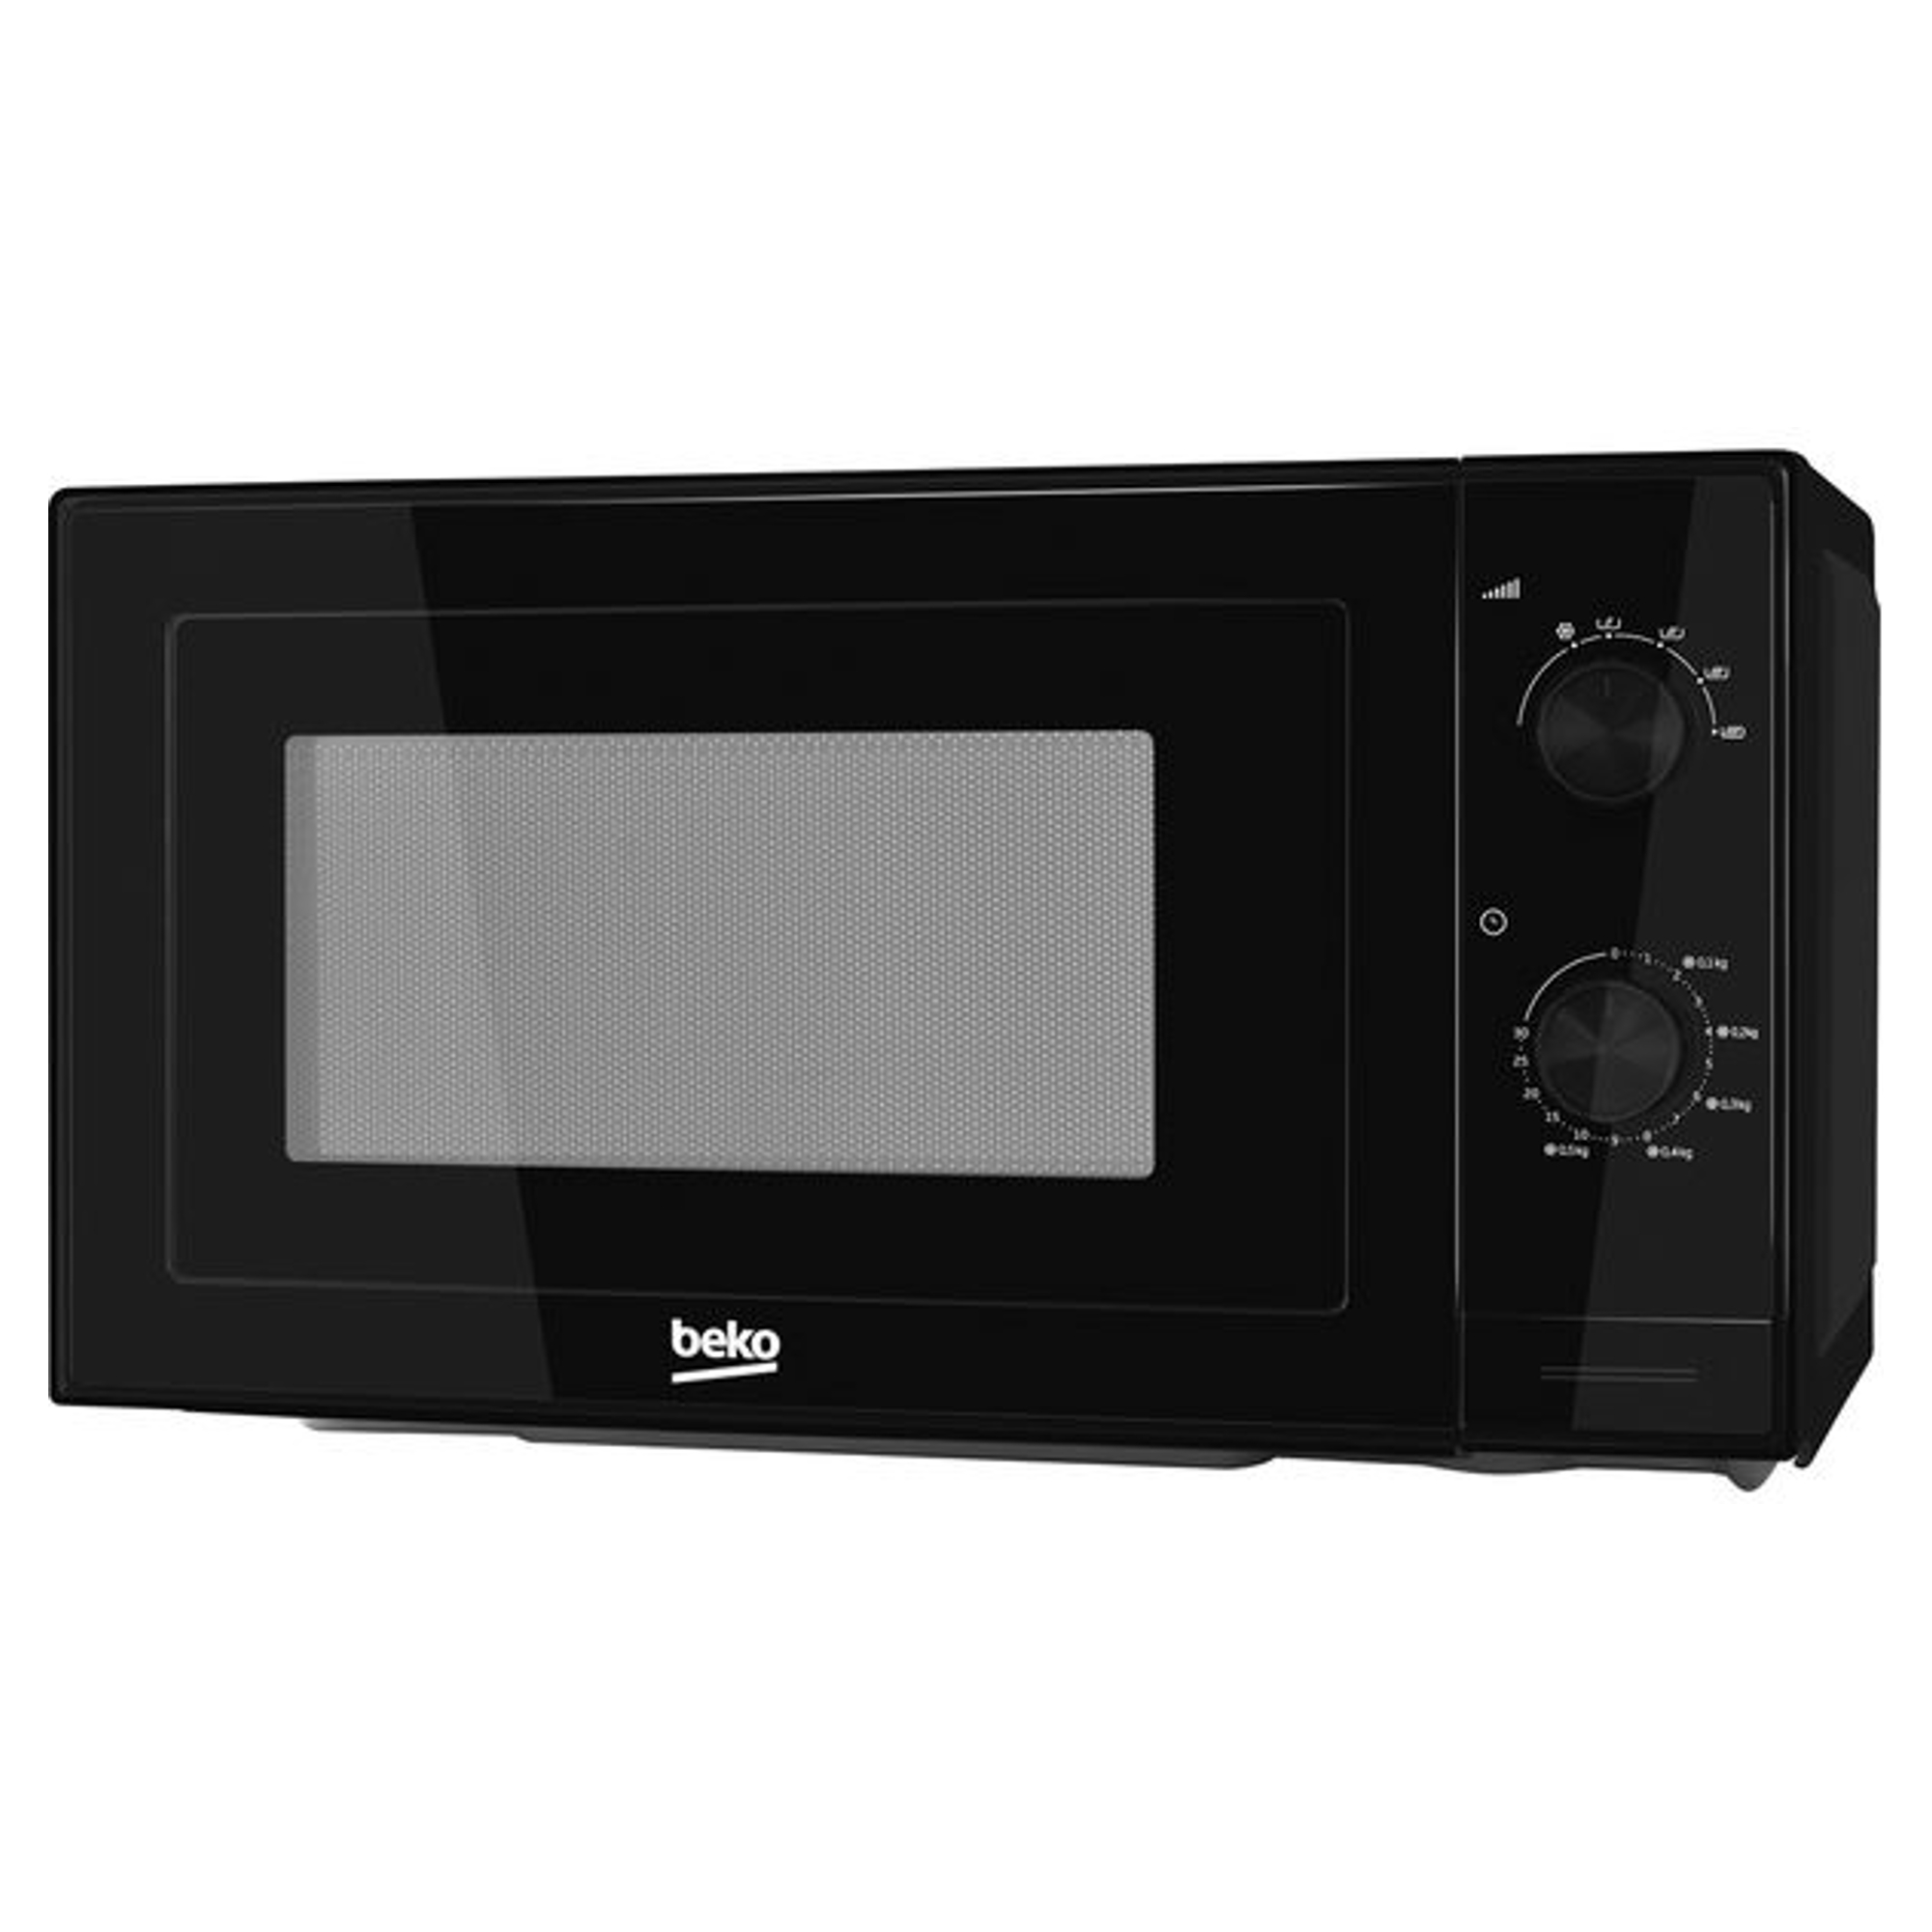 Beko Moc20100b Compact 20 Litre Microwave Hughes